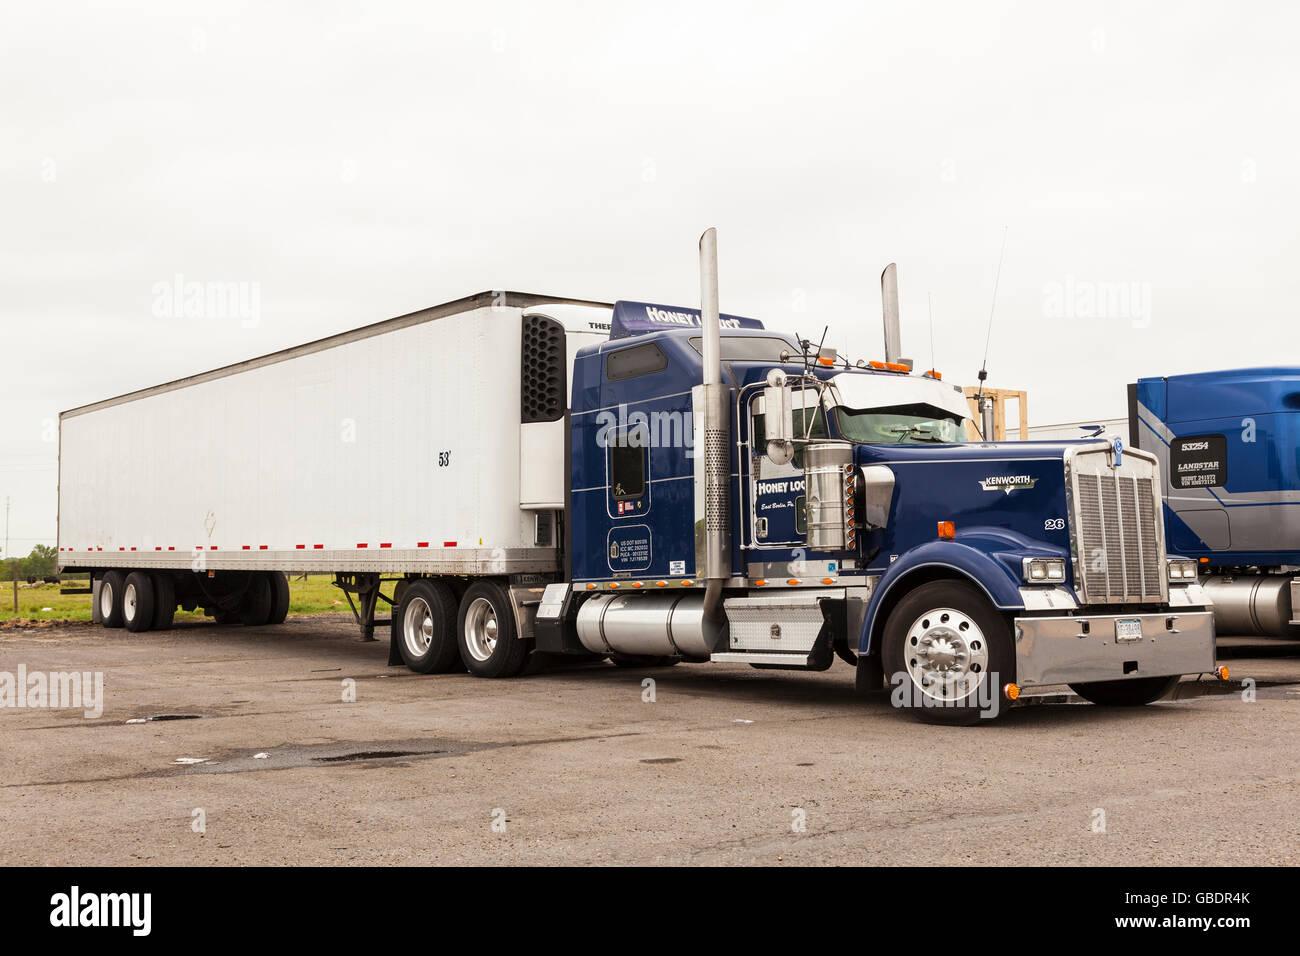 Classic Kenworth semi truck in the USA - Stock Image